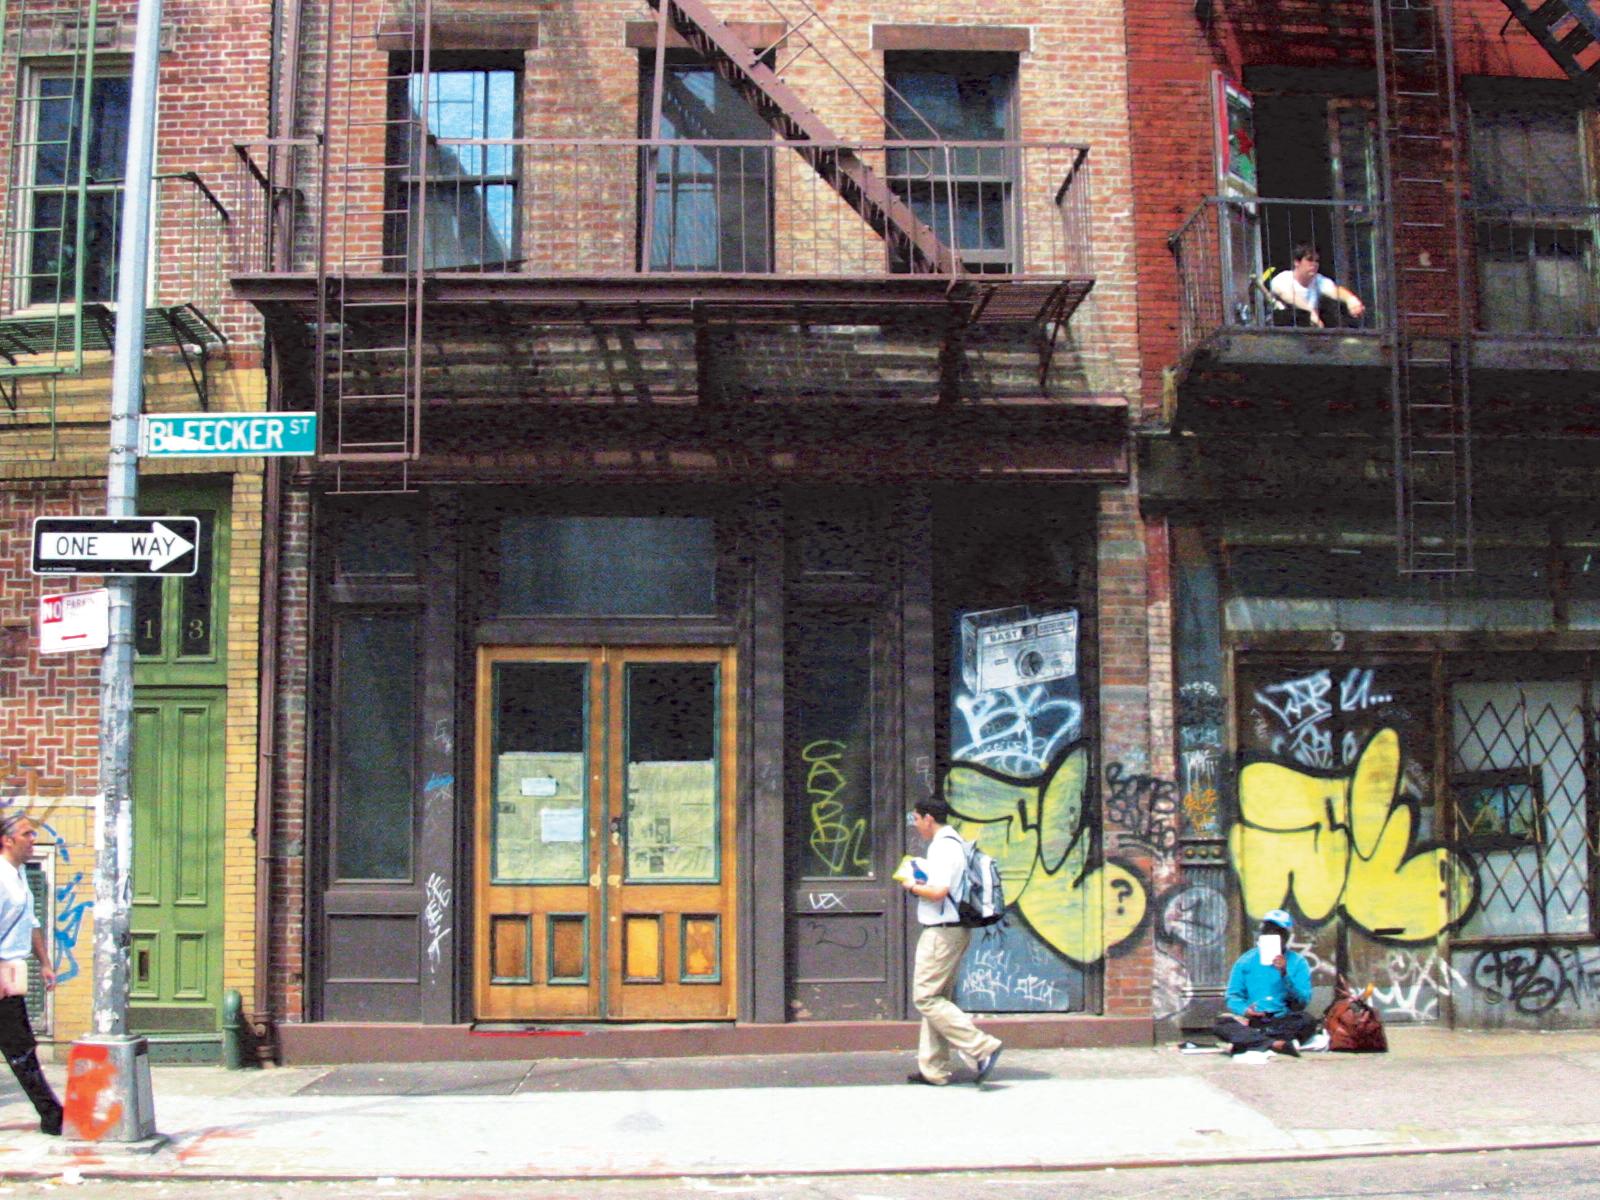 Bleecker Street, New York City